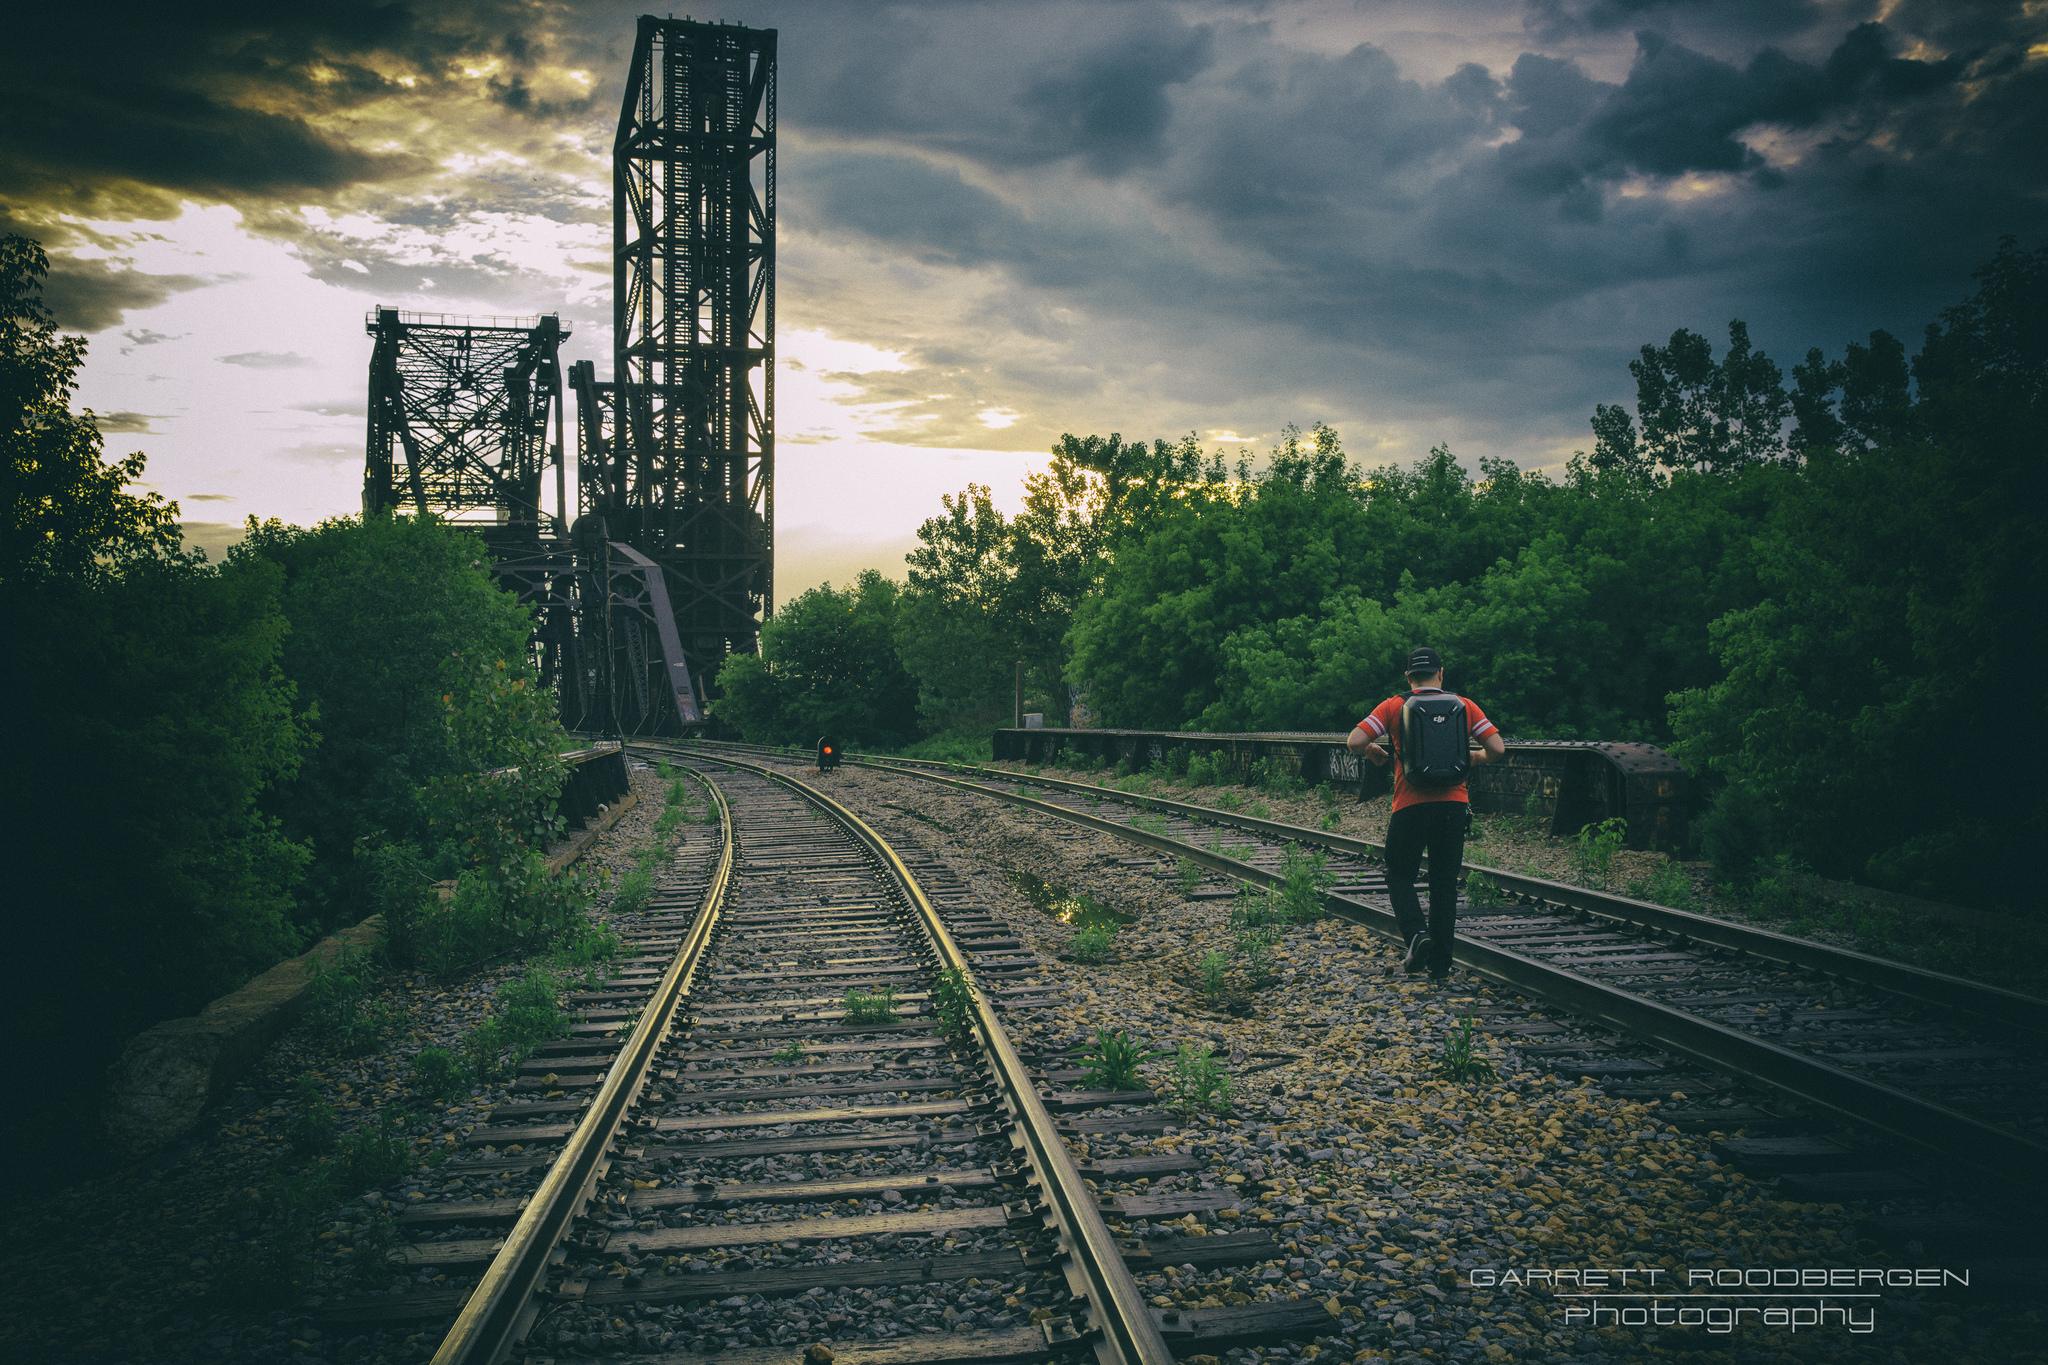 Walk #photographyislife #photography #canon #chicago #citylife #sunset #life #train #tracks #railroad #walk #bridge #sky #lonely #walkingdead #homage #apocalypse #after #empty #world #light